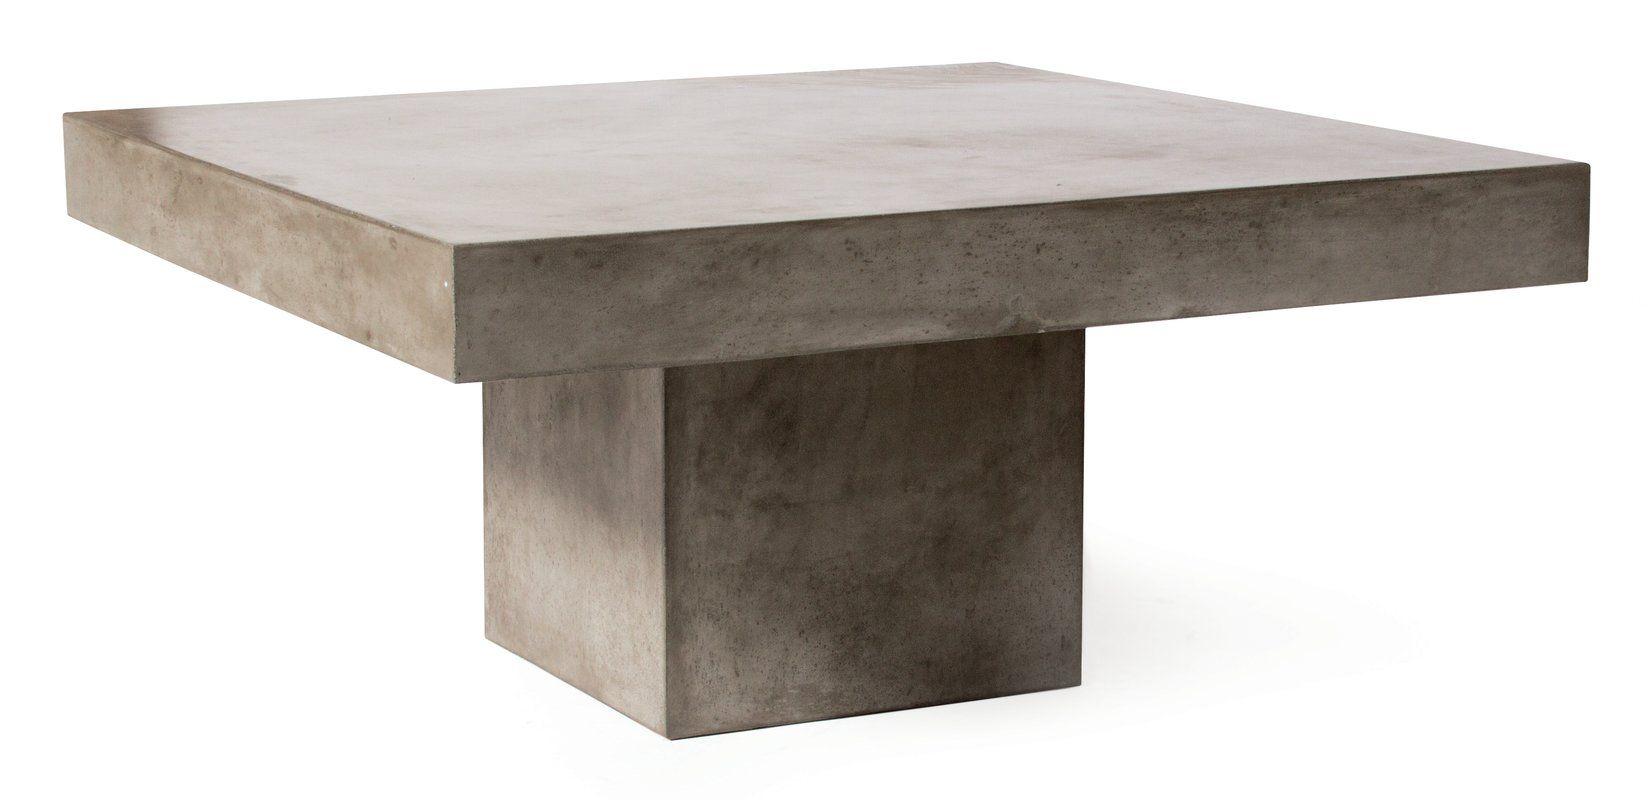 Provence Concrete Coffee Table Concrete Coffee Table Solid Wood Coffee Table Concrete Dining Table